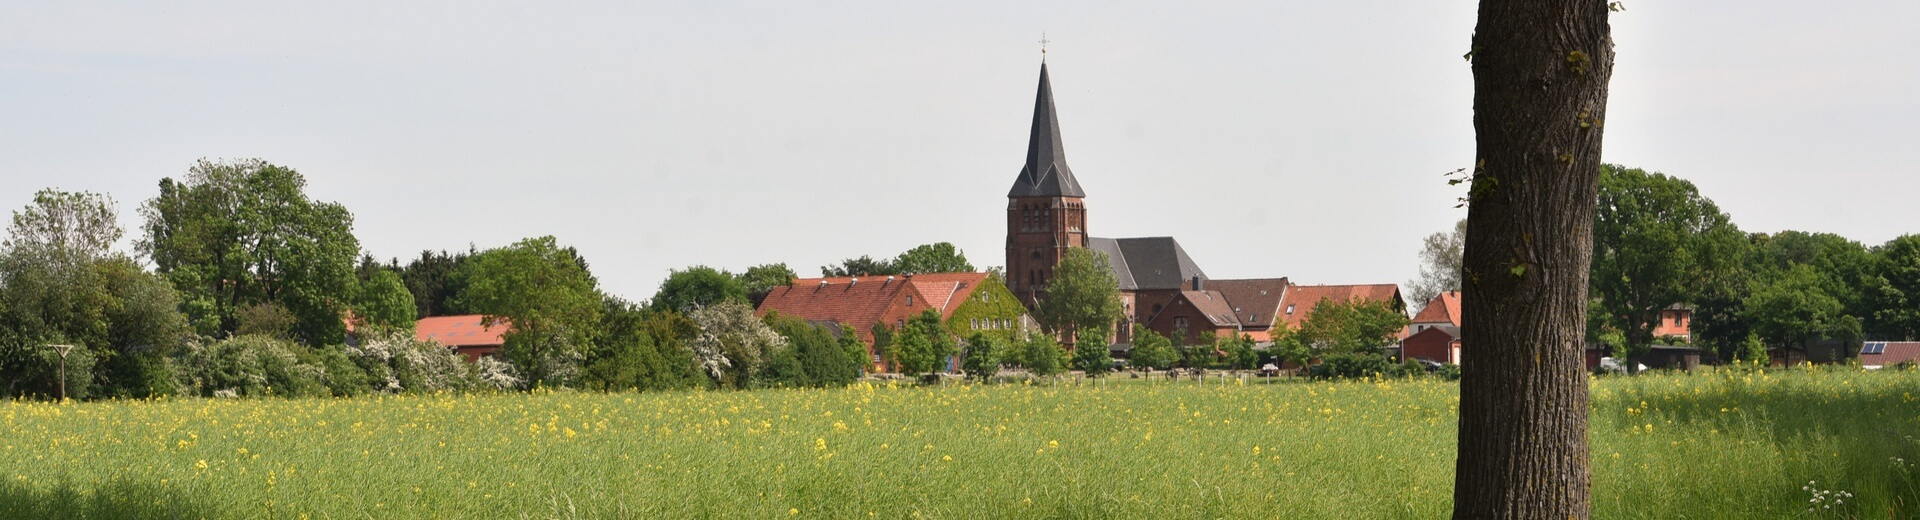 Rathaus_Folgeseite_Kirche_Lunsen